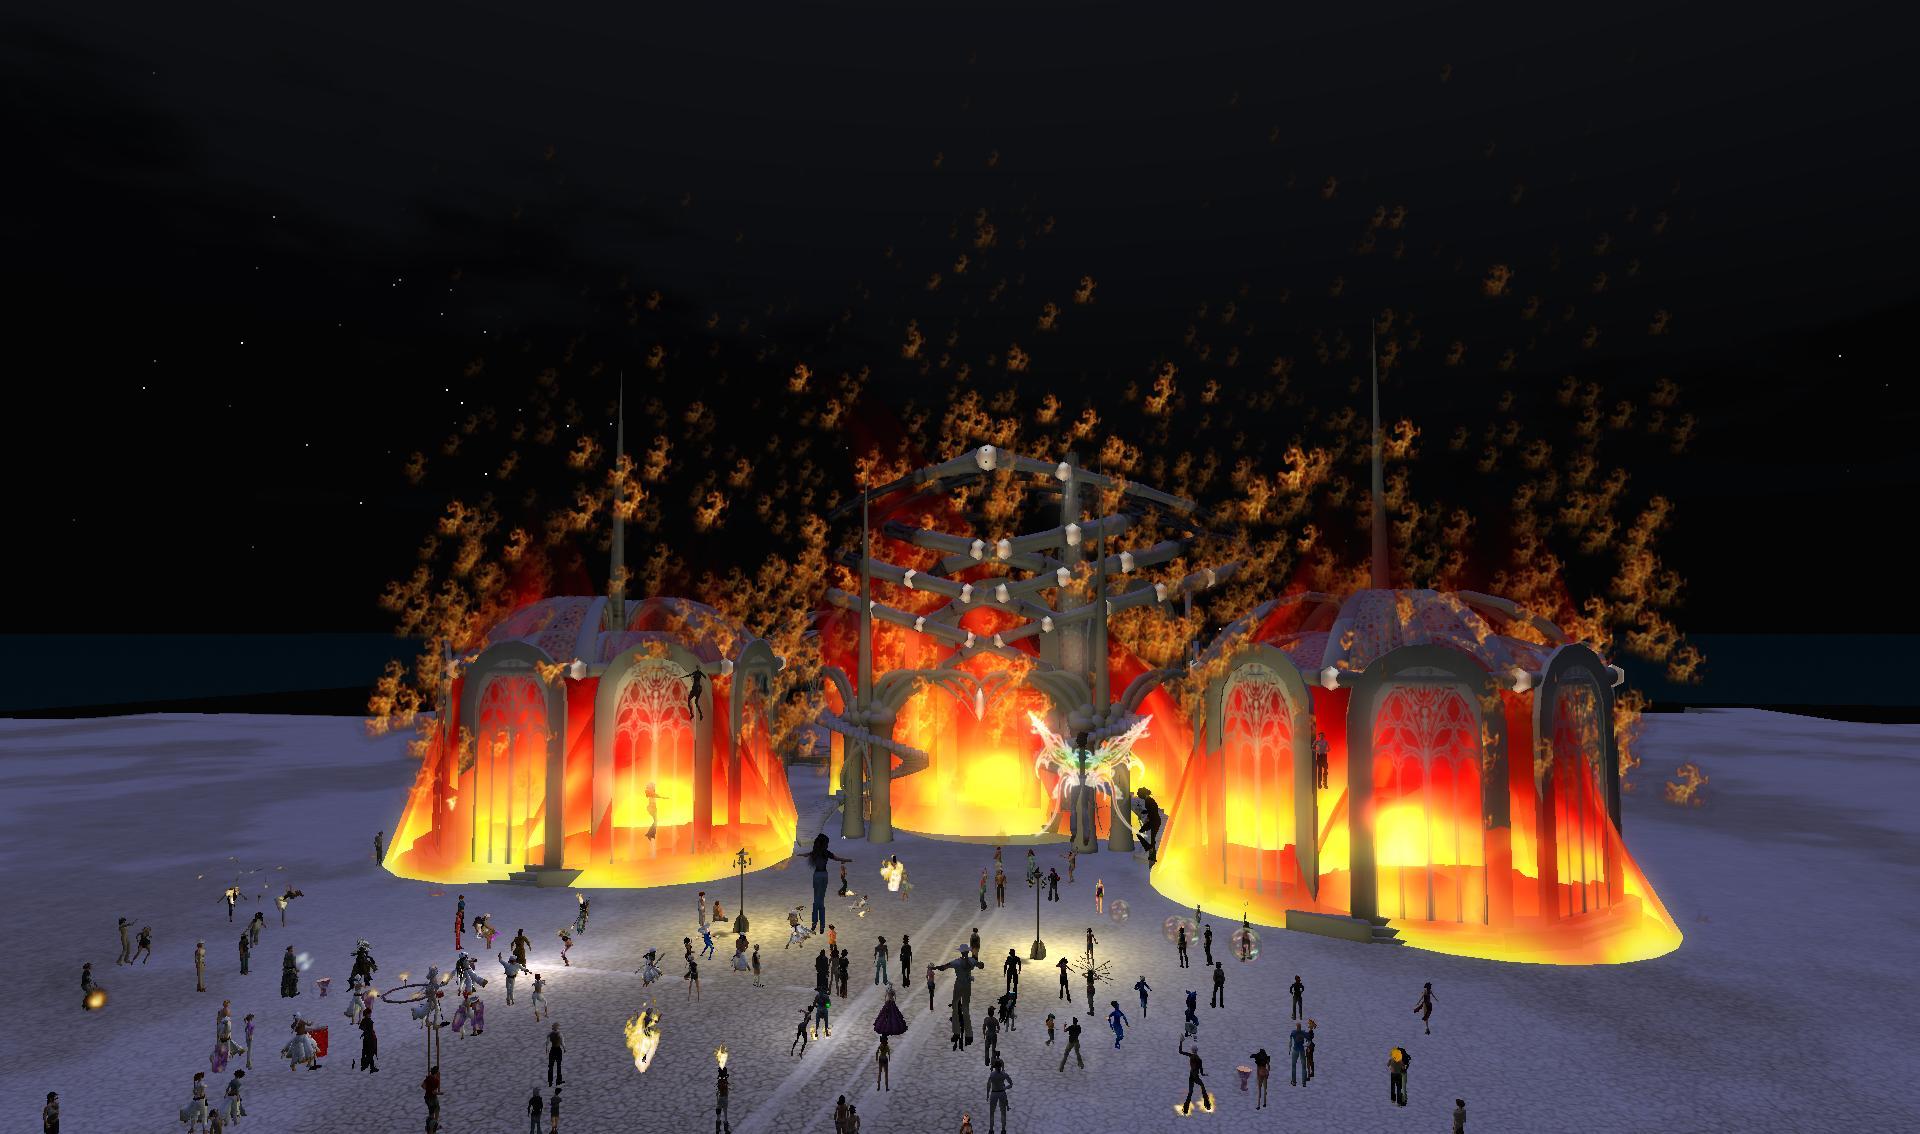 temple temple burning bright